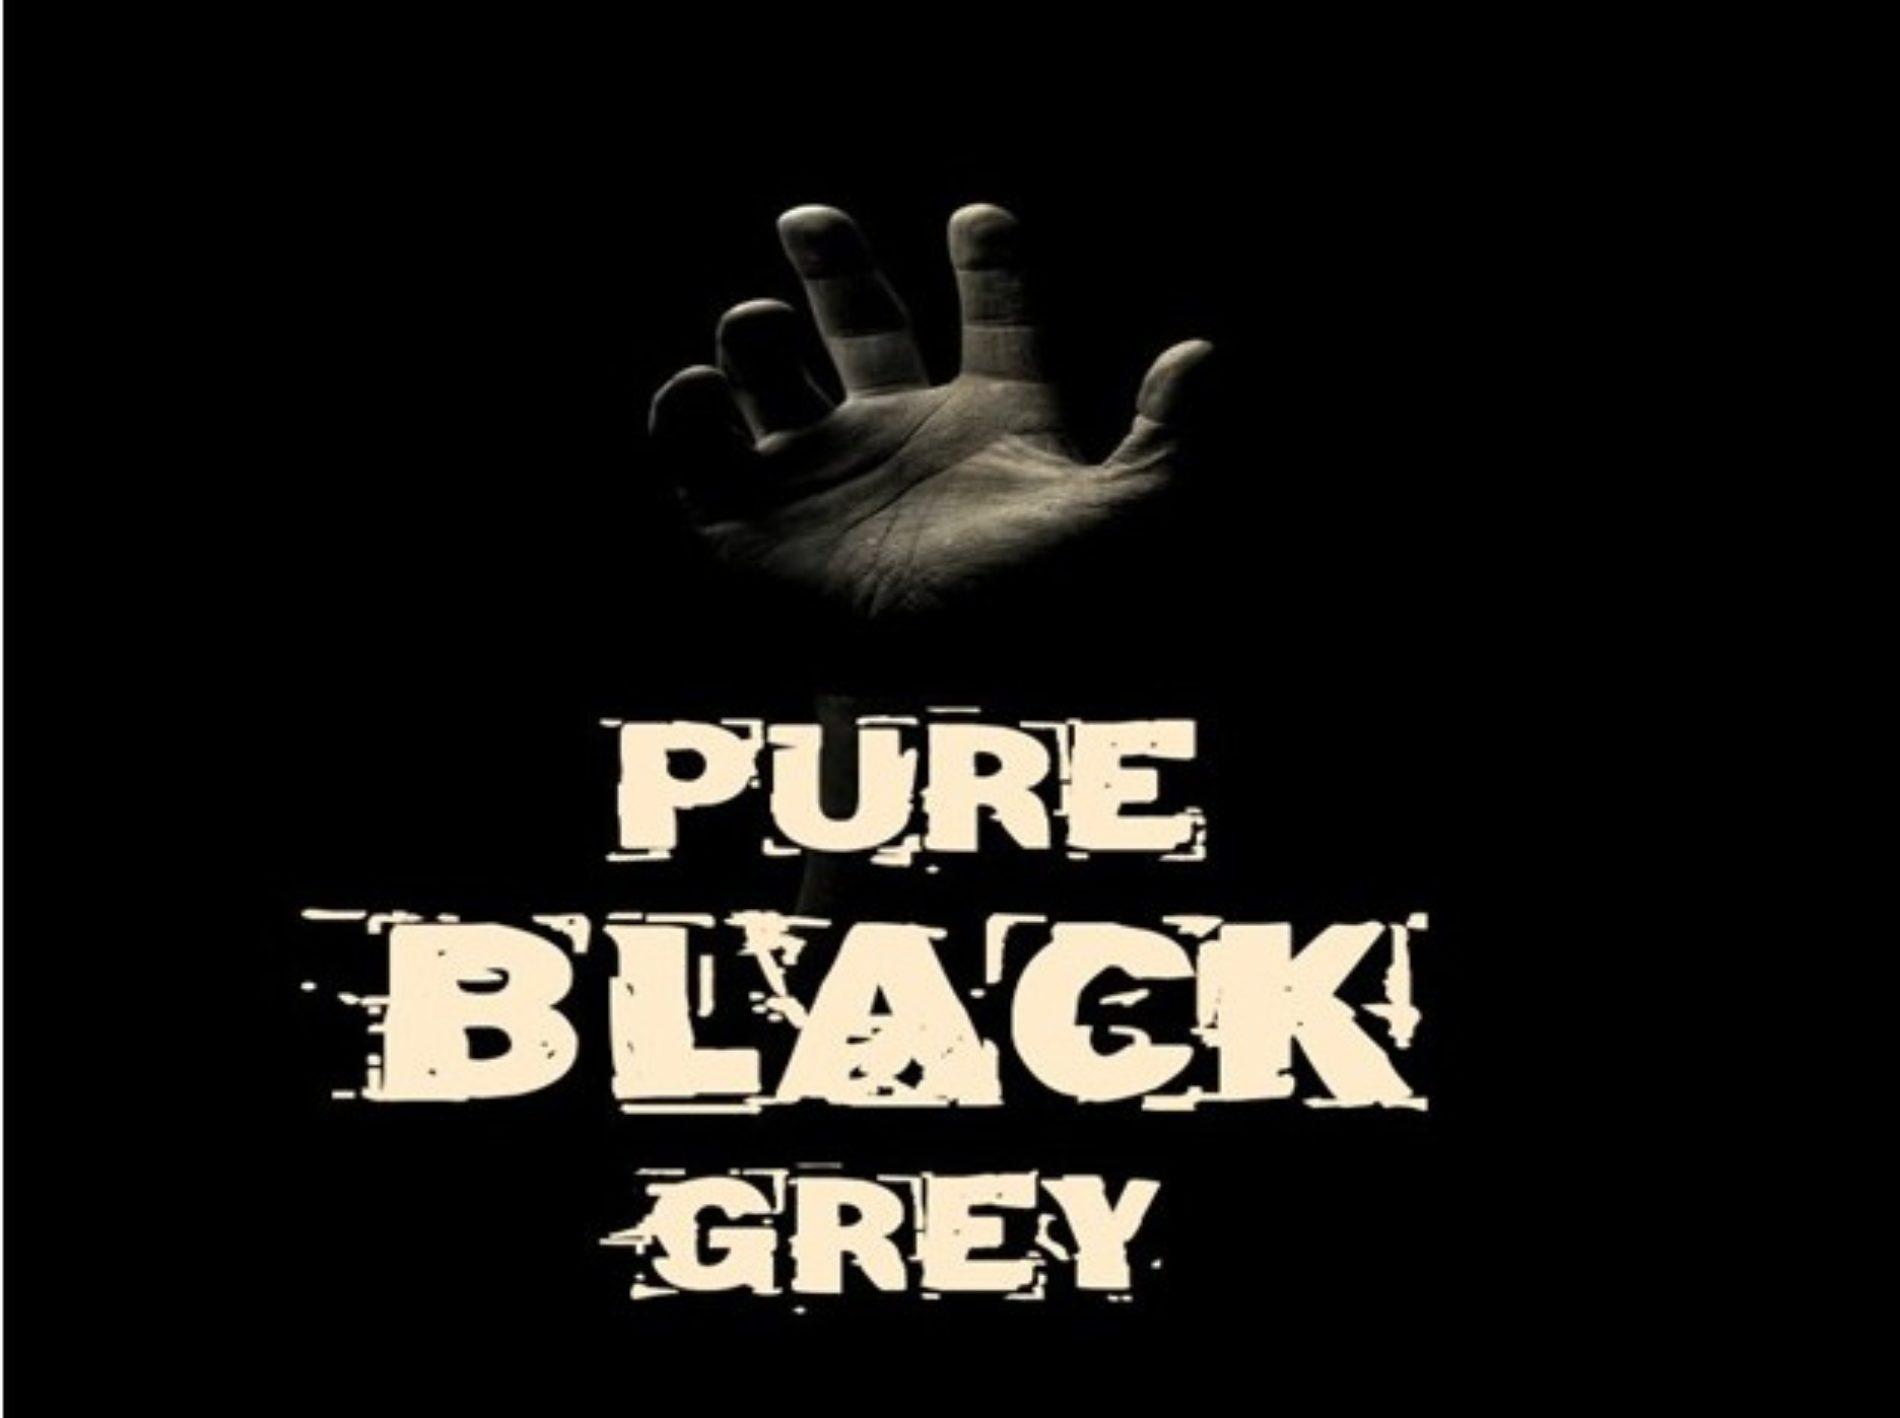 PURE BLACK GREY